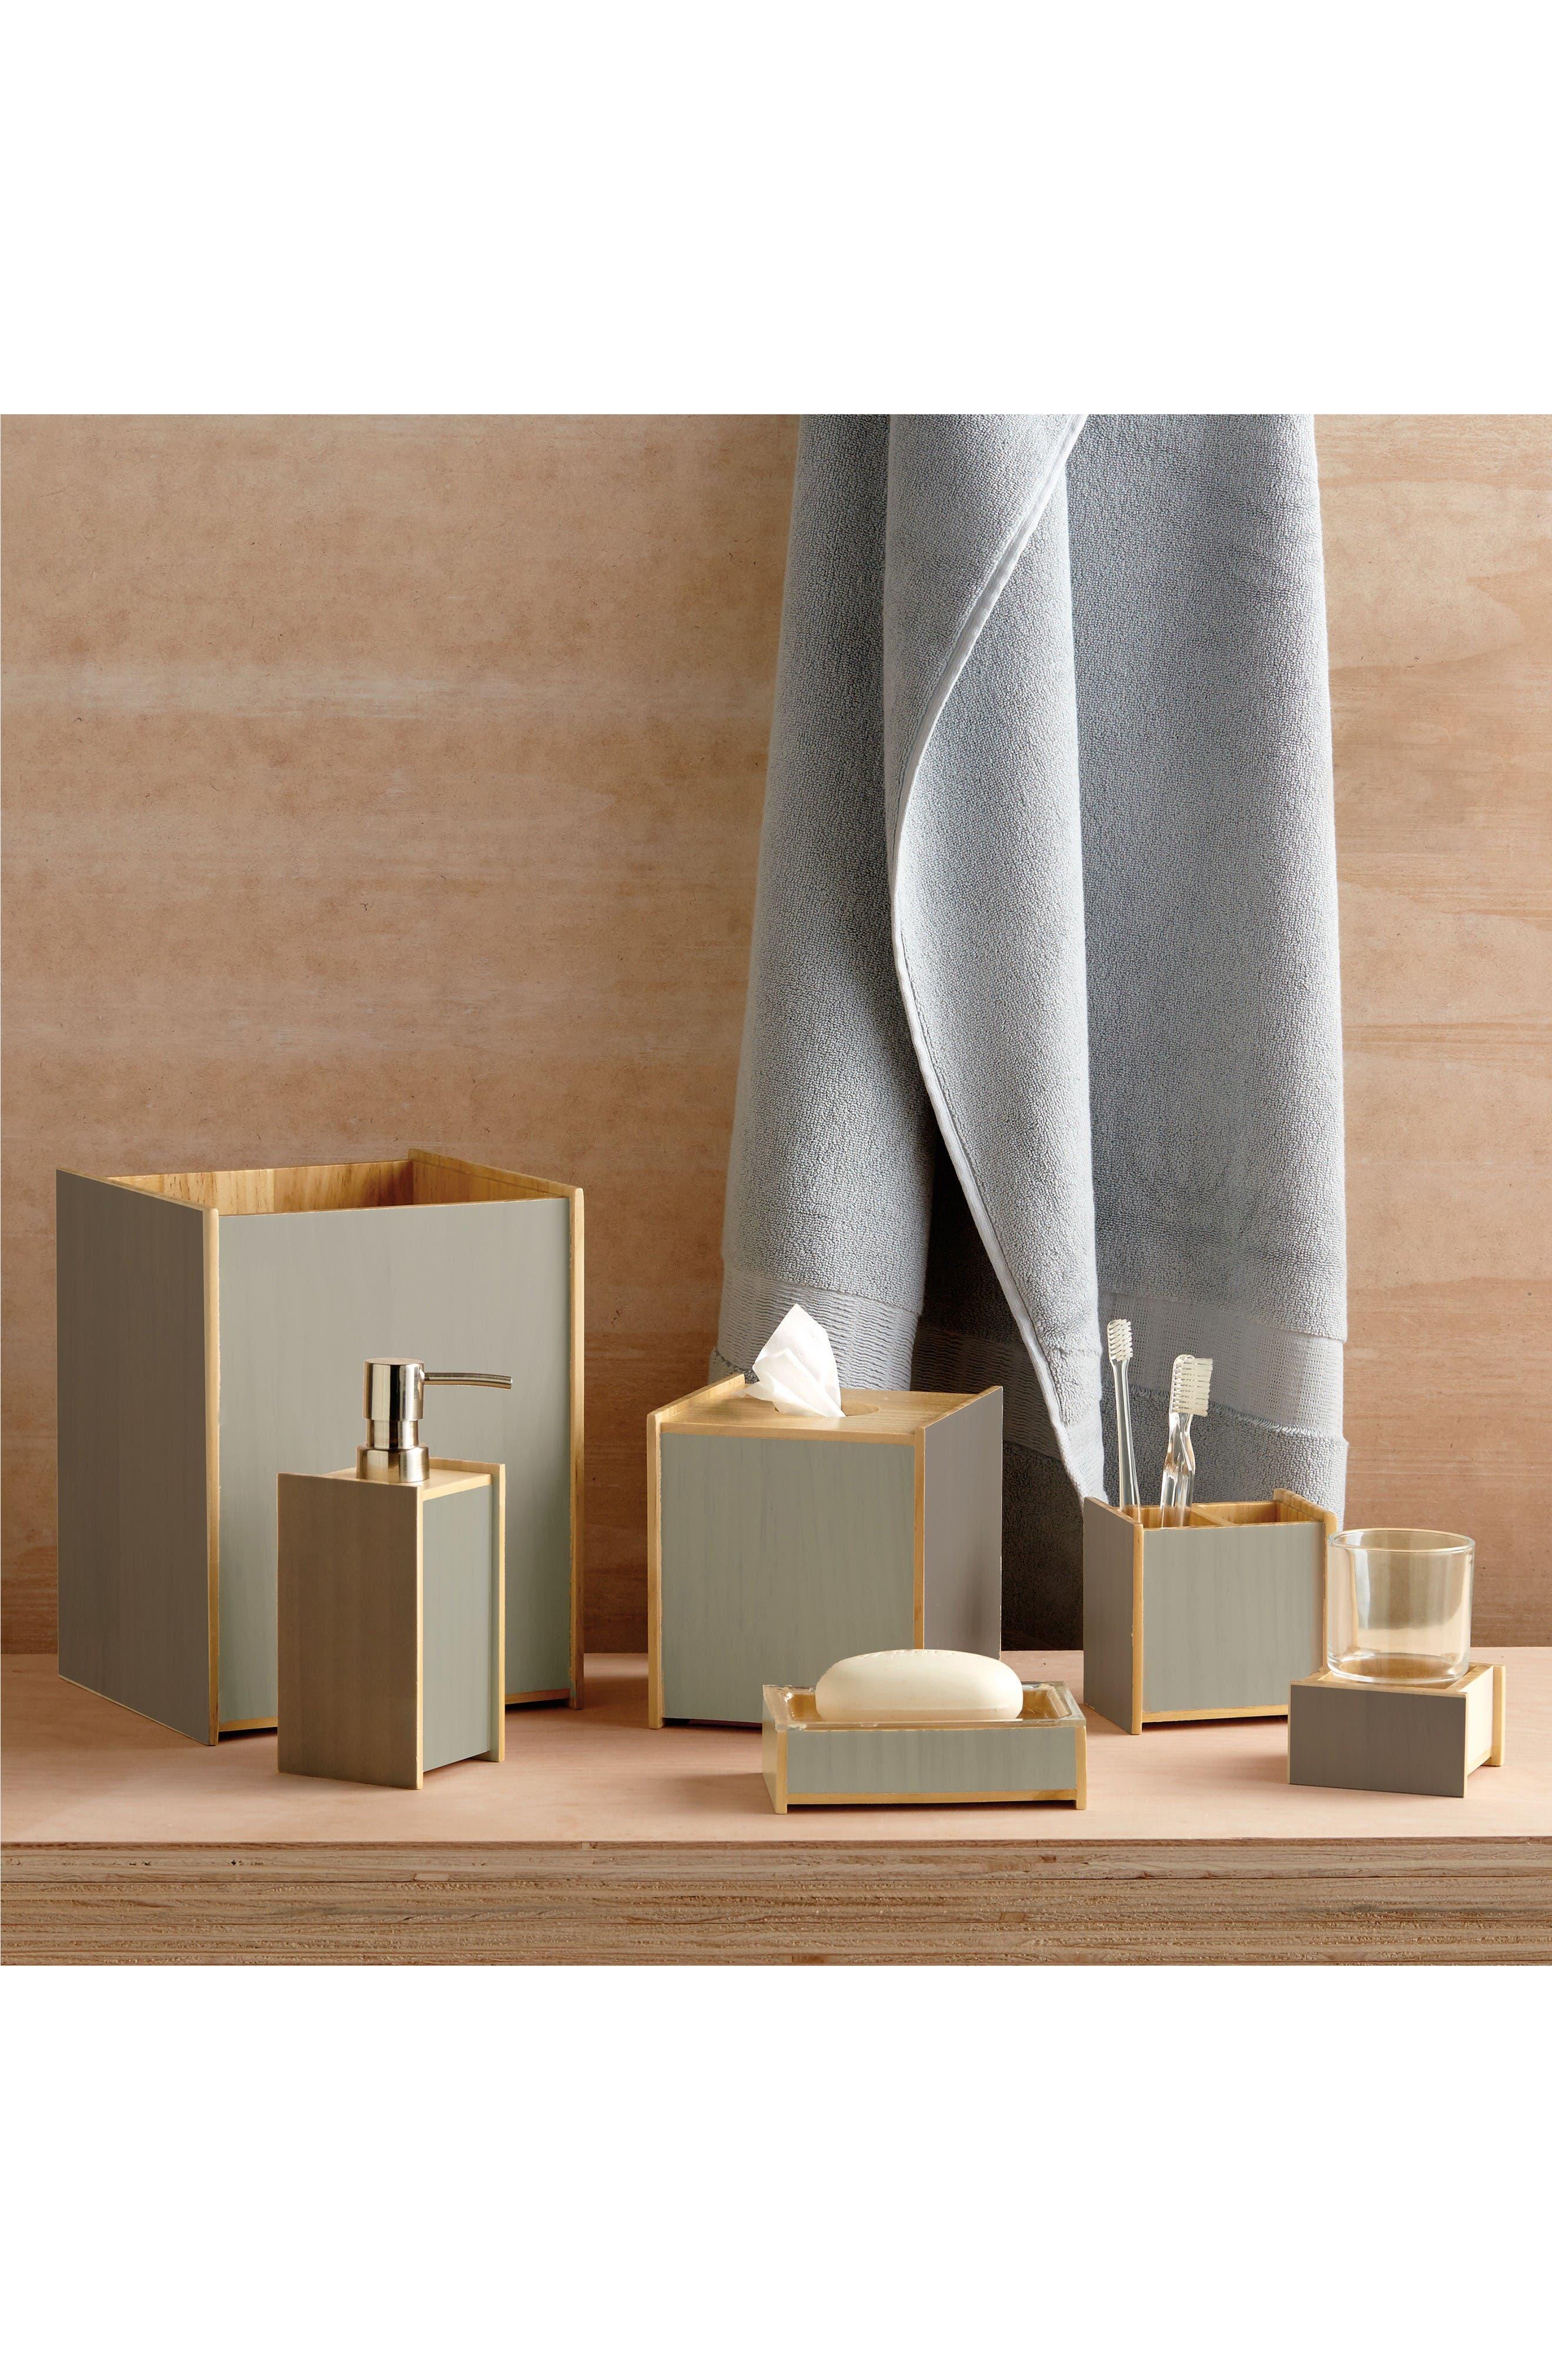 Alternate Image 3  - DKNY Hue Tissue Box Cover